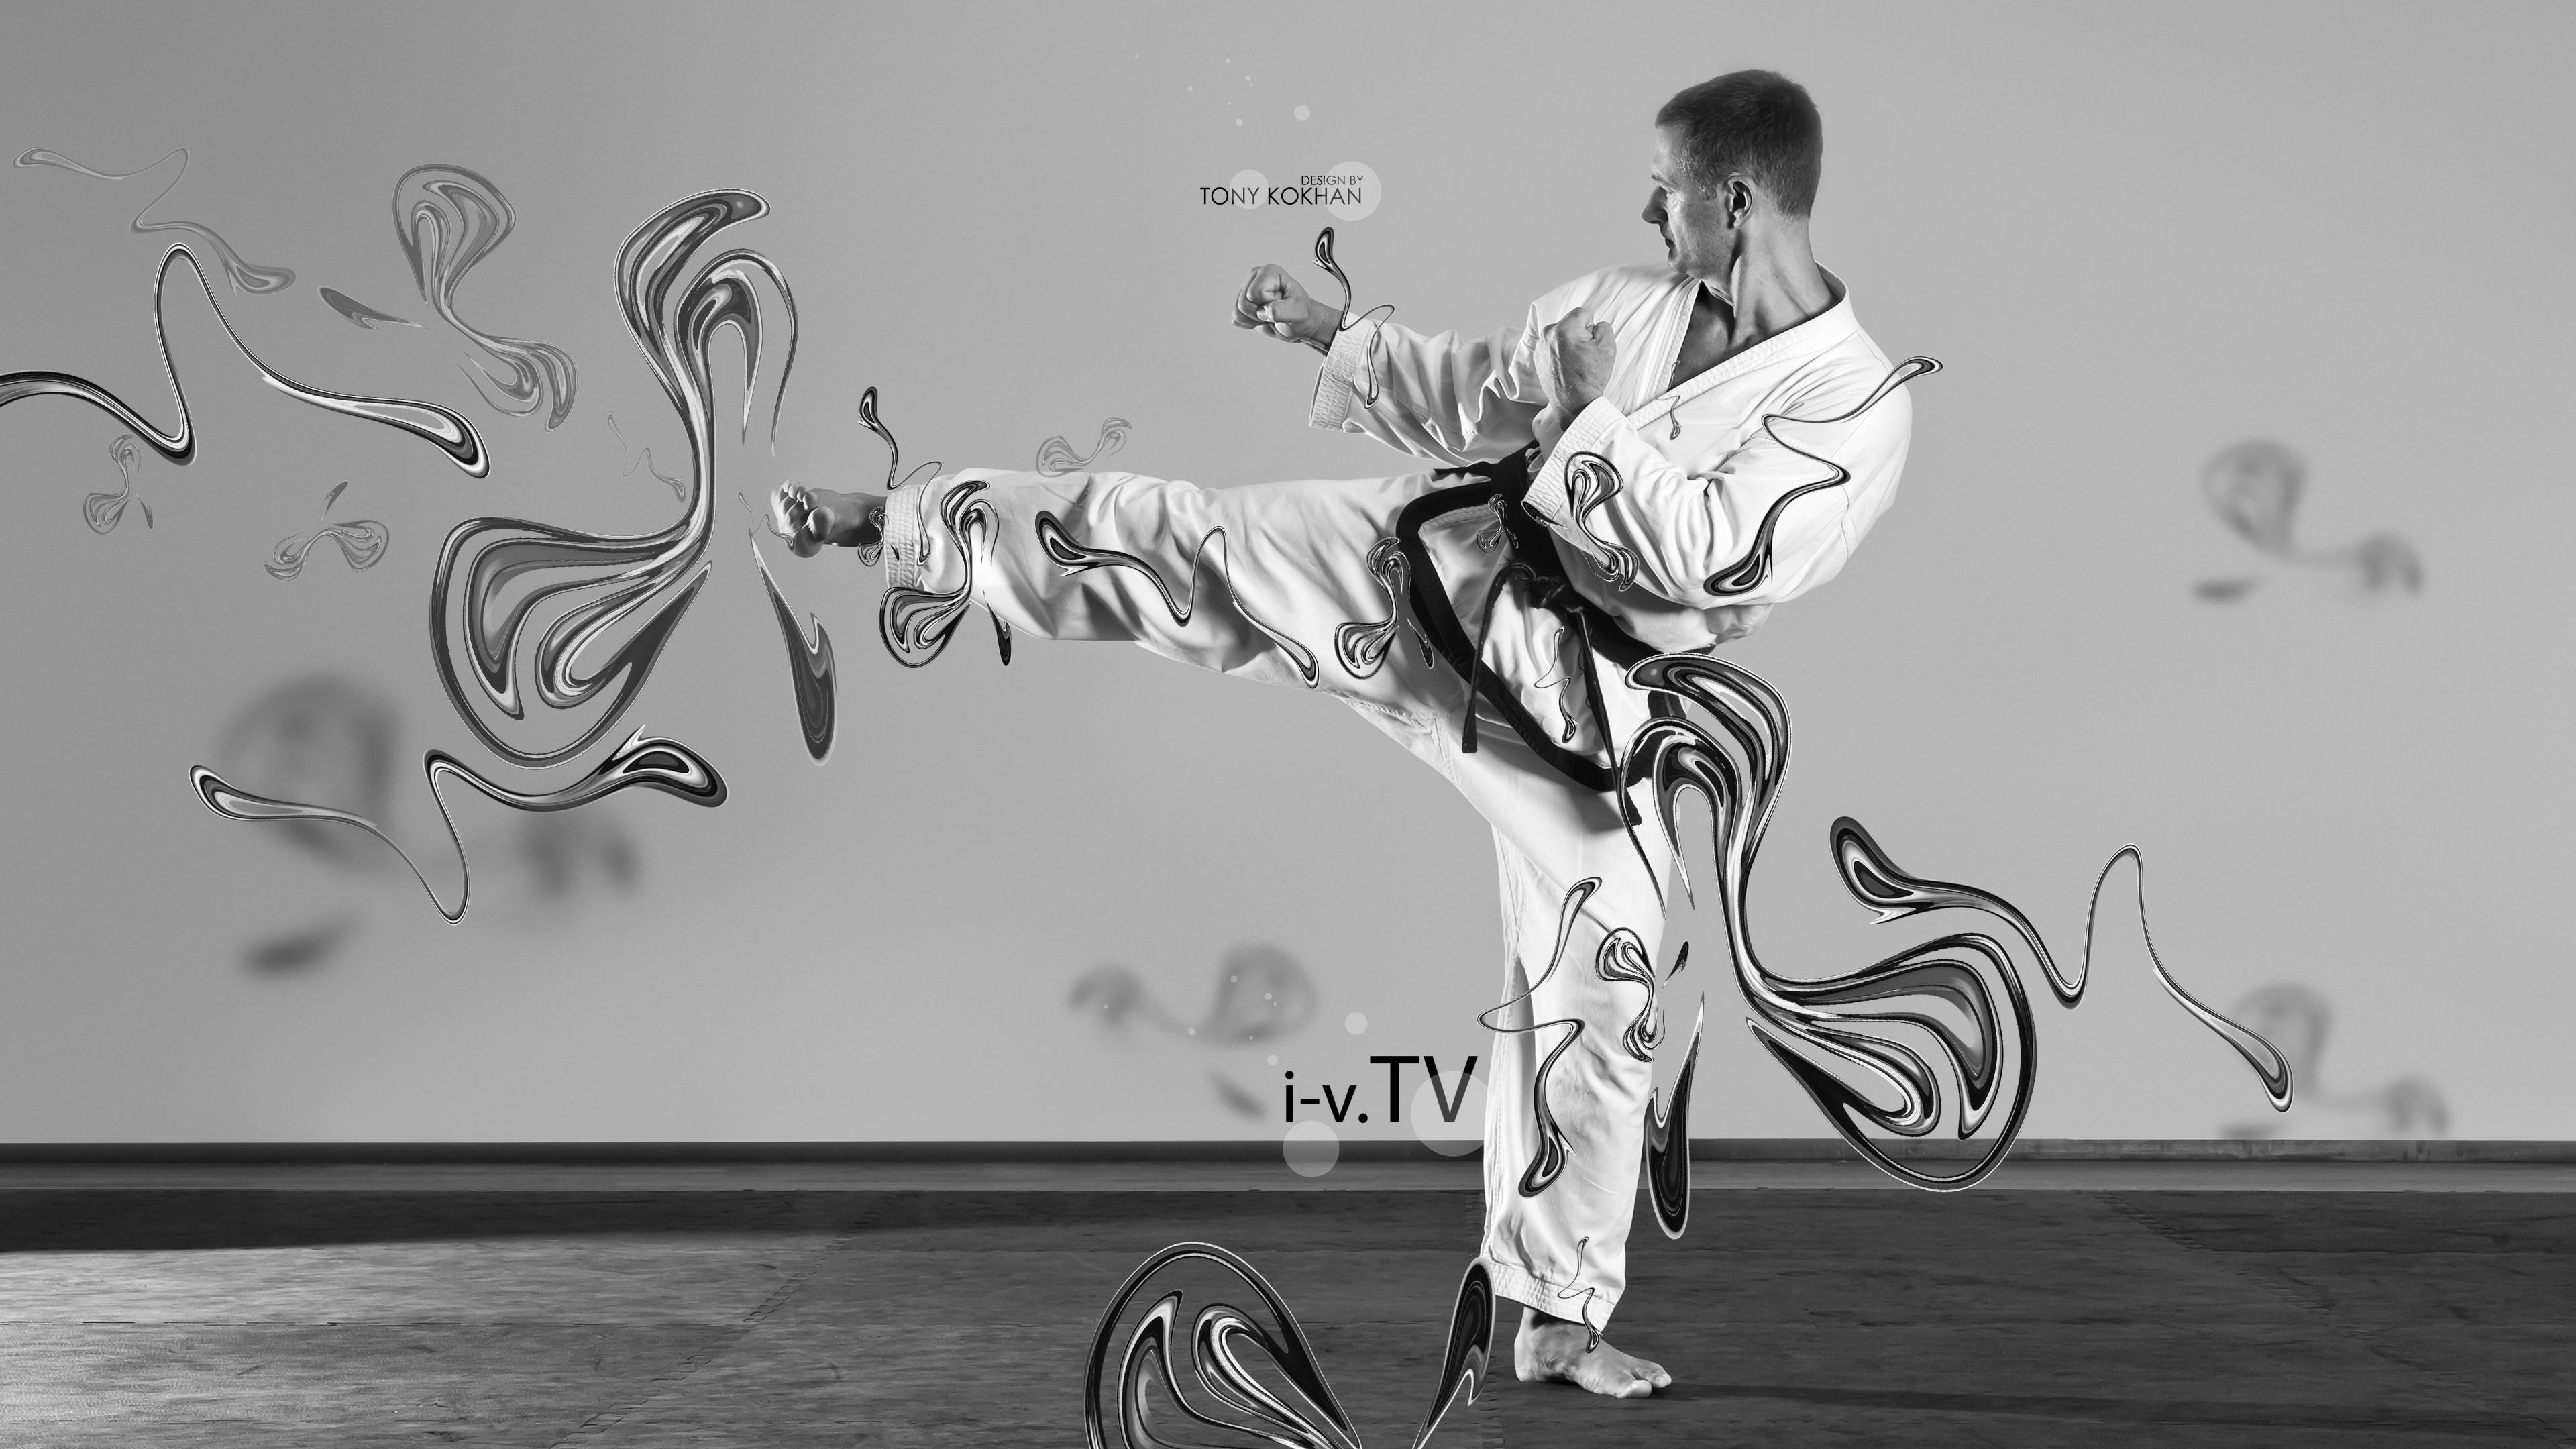 Taekwondo Itf Wallpaper 3d Taekwondo Wallpapers 60 Images